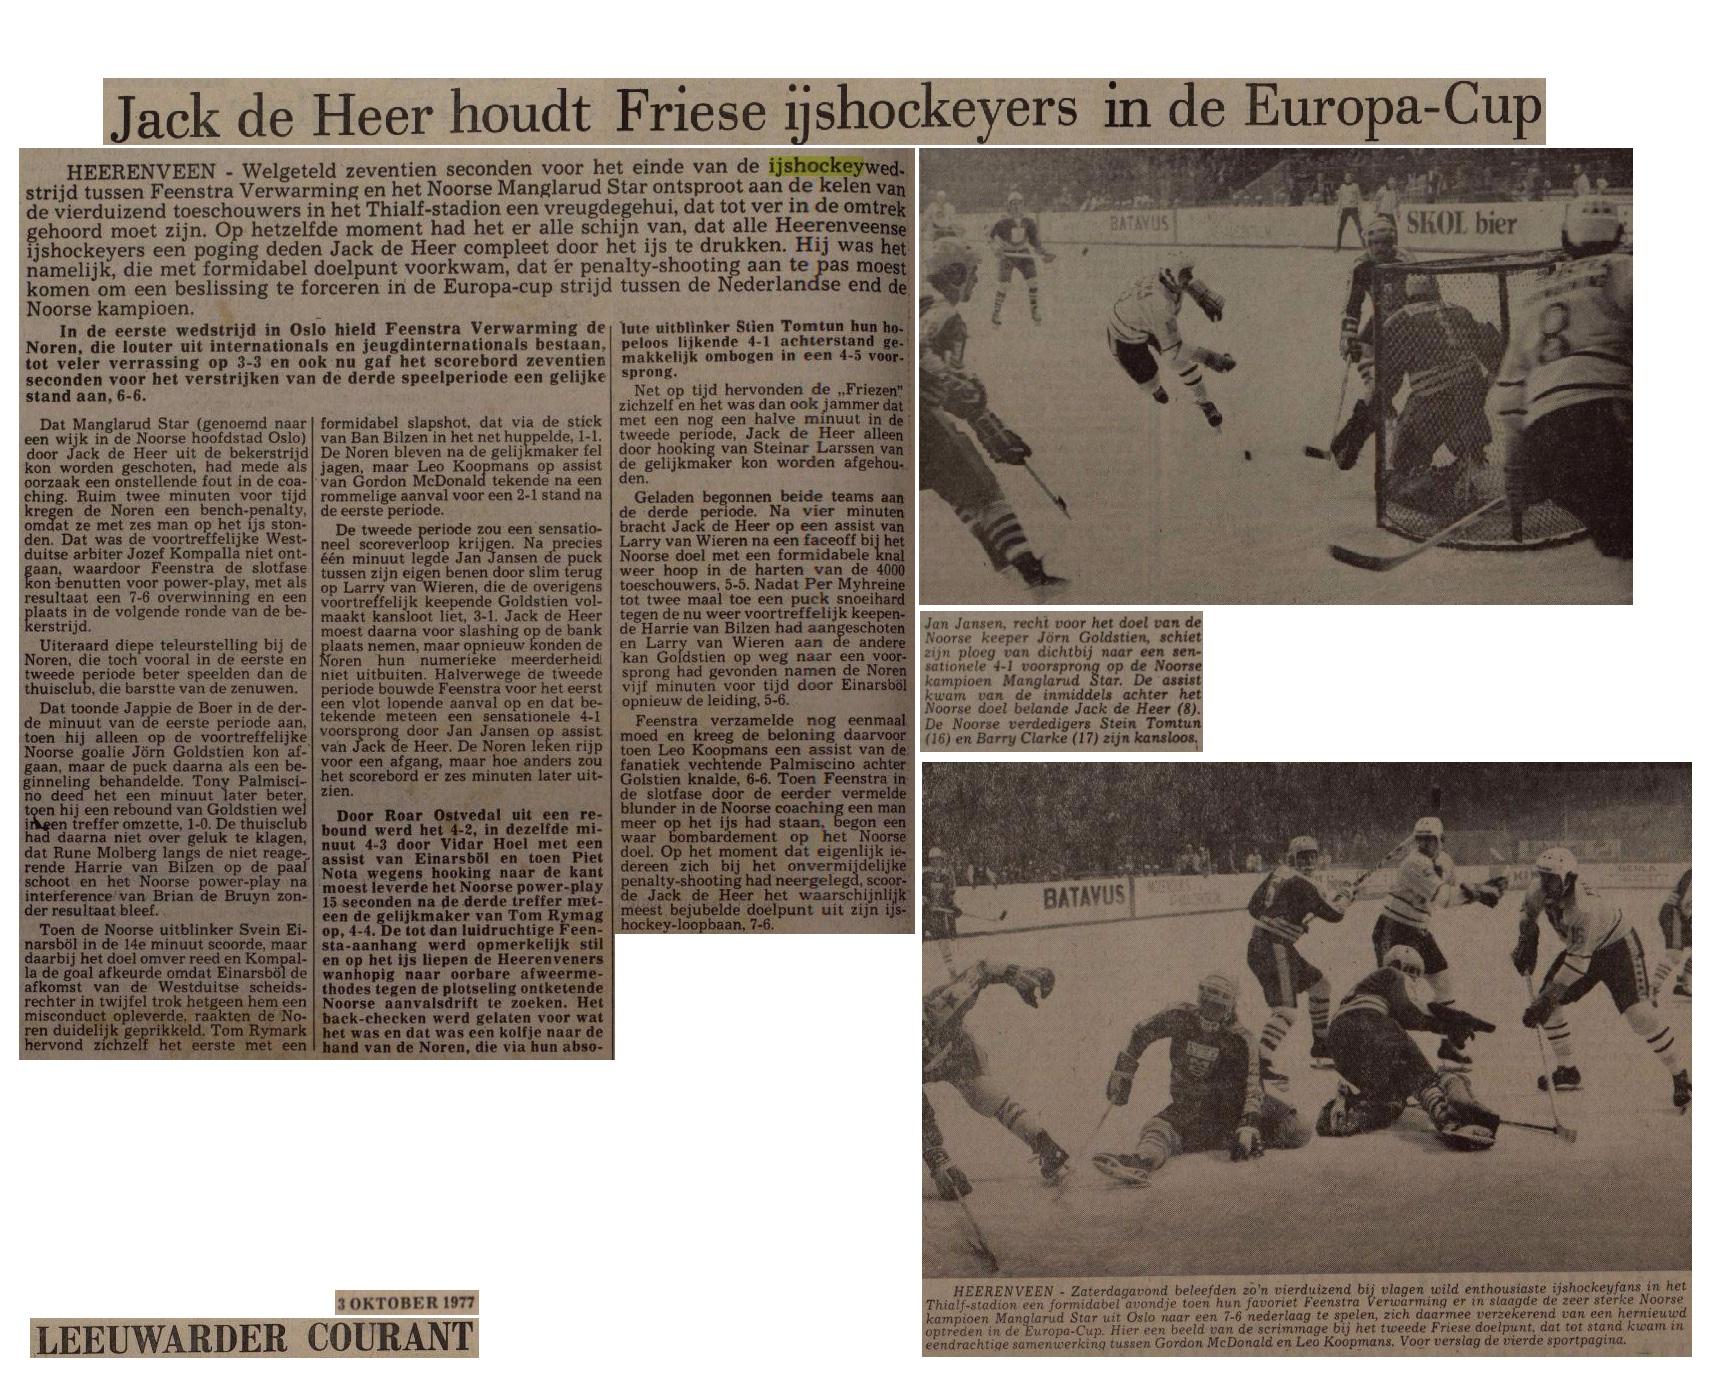 europa cup 77-78 (3.10.77).jpg